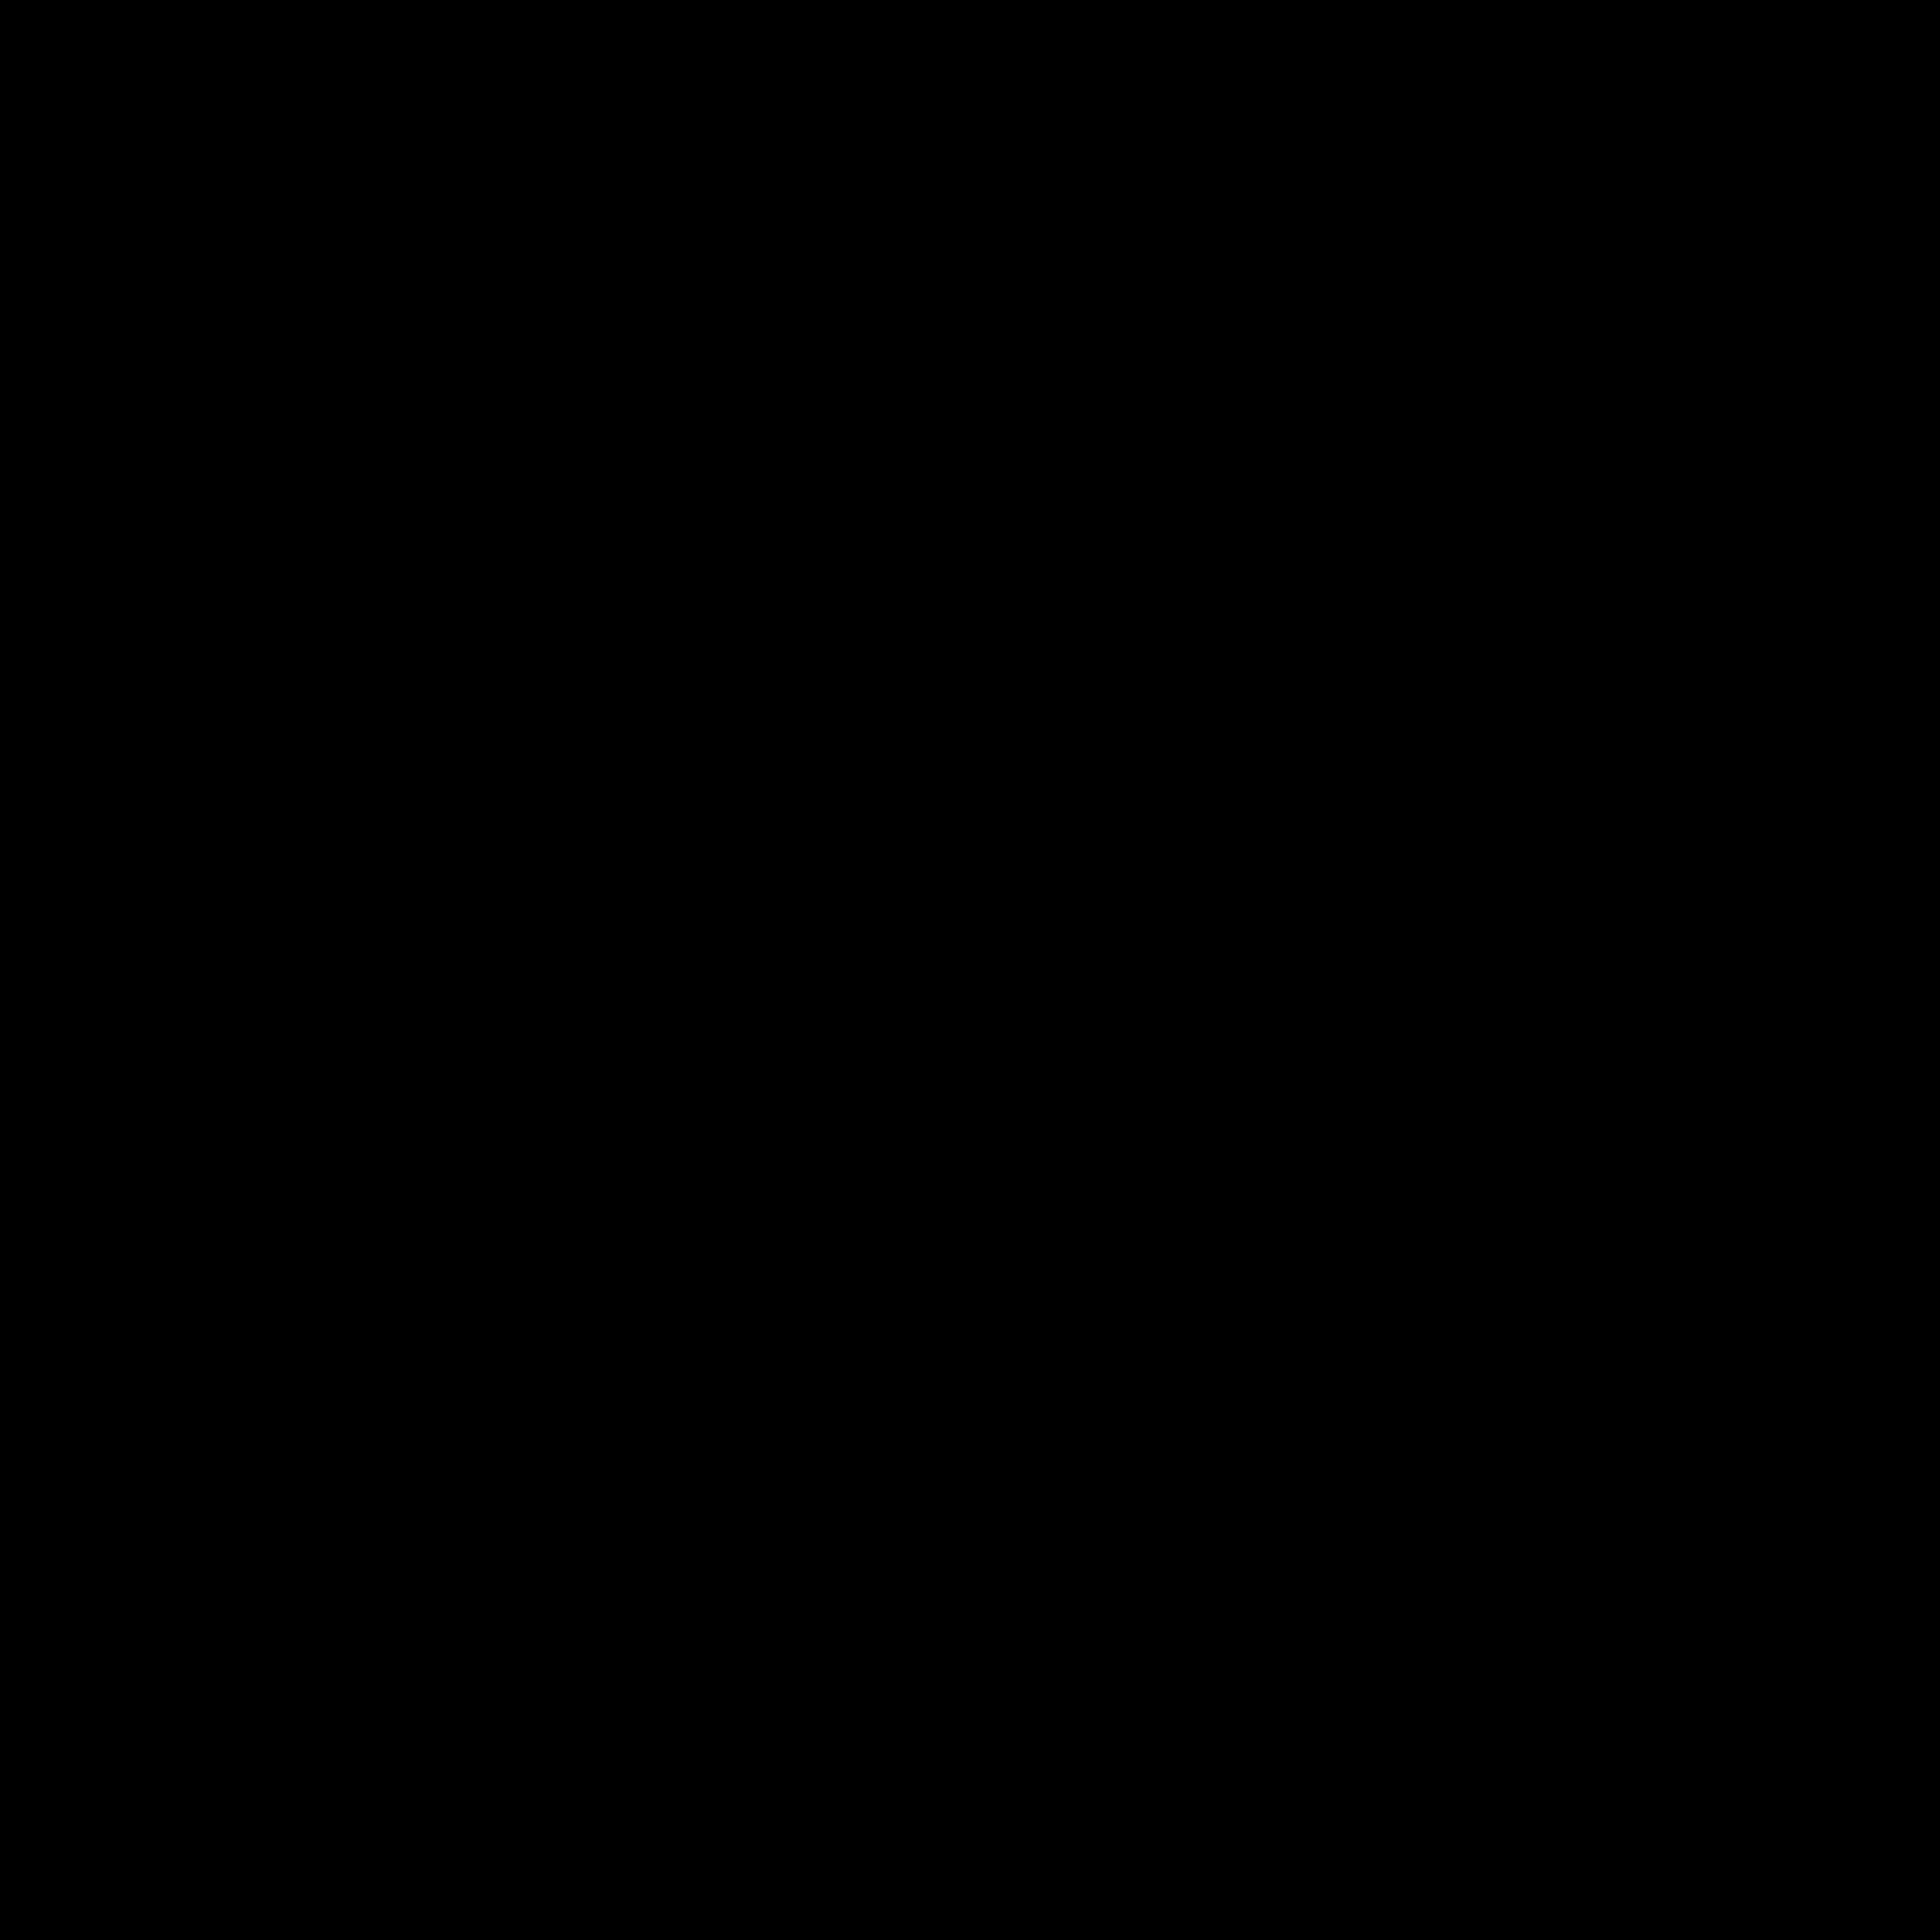 File gear wikimedia commons. Gears clipart svg